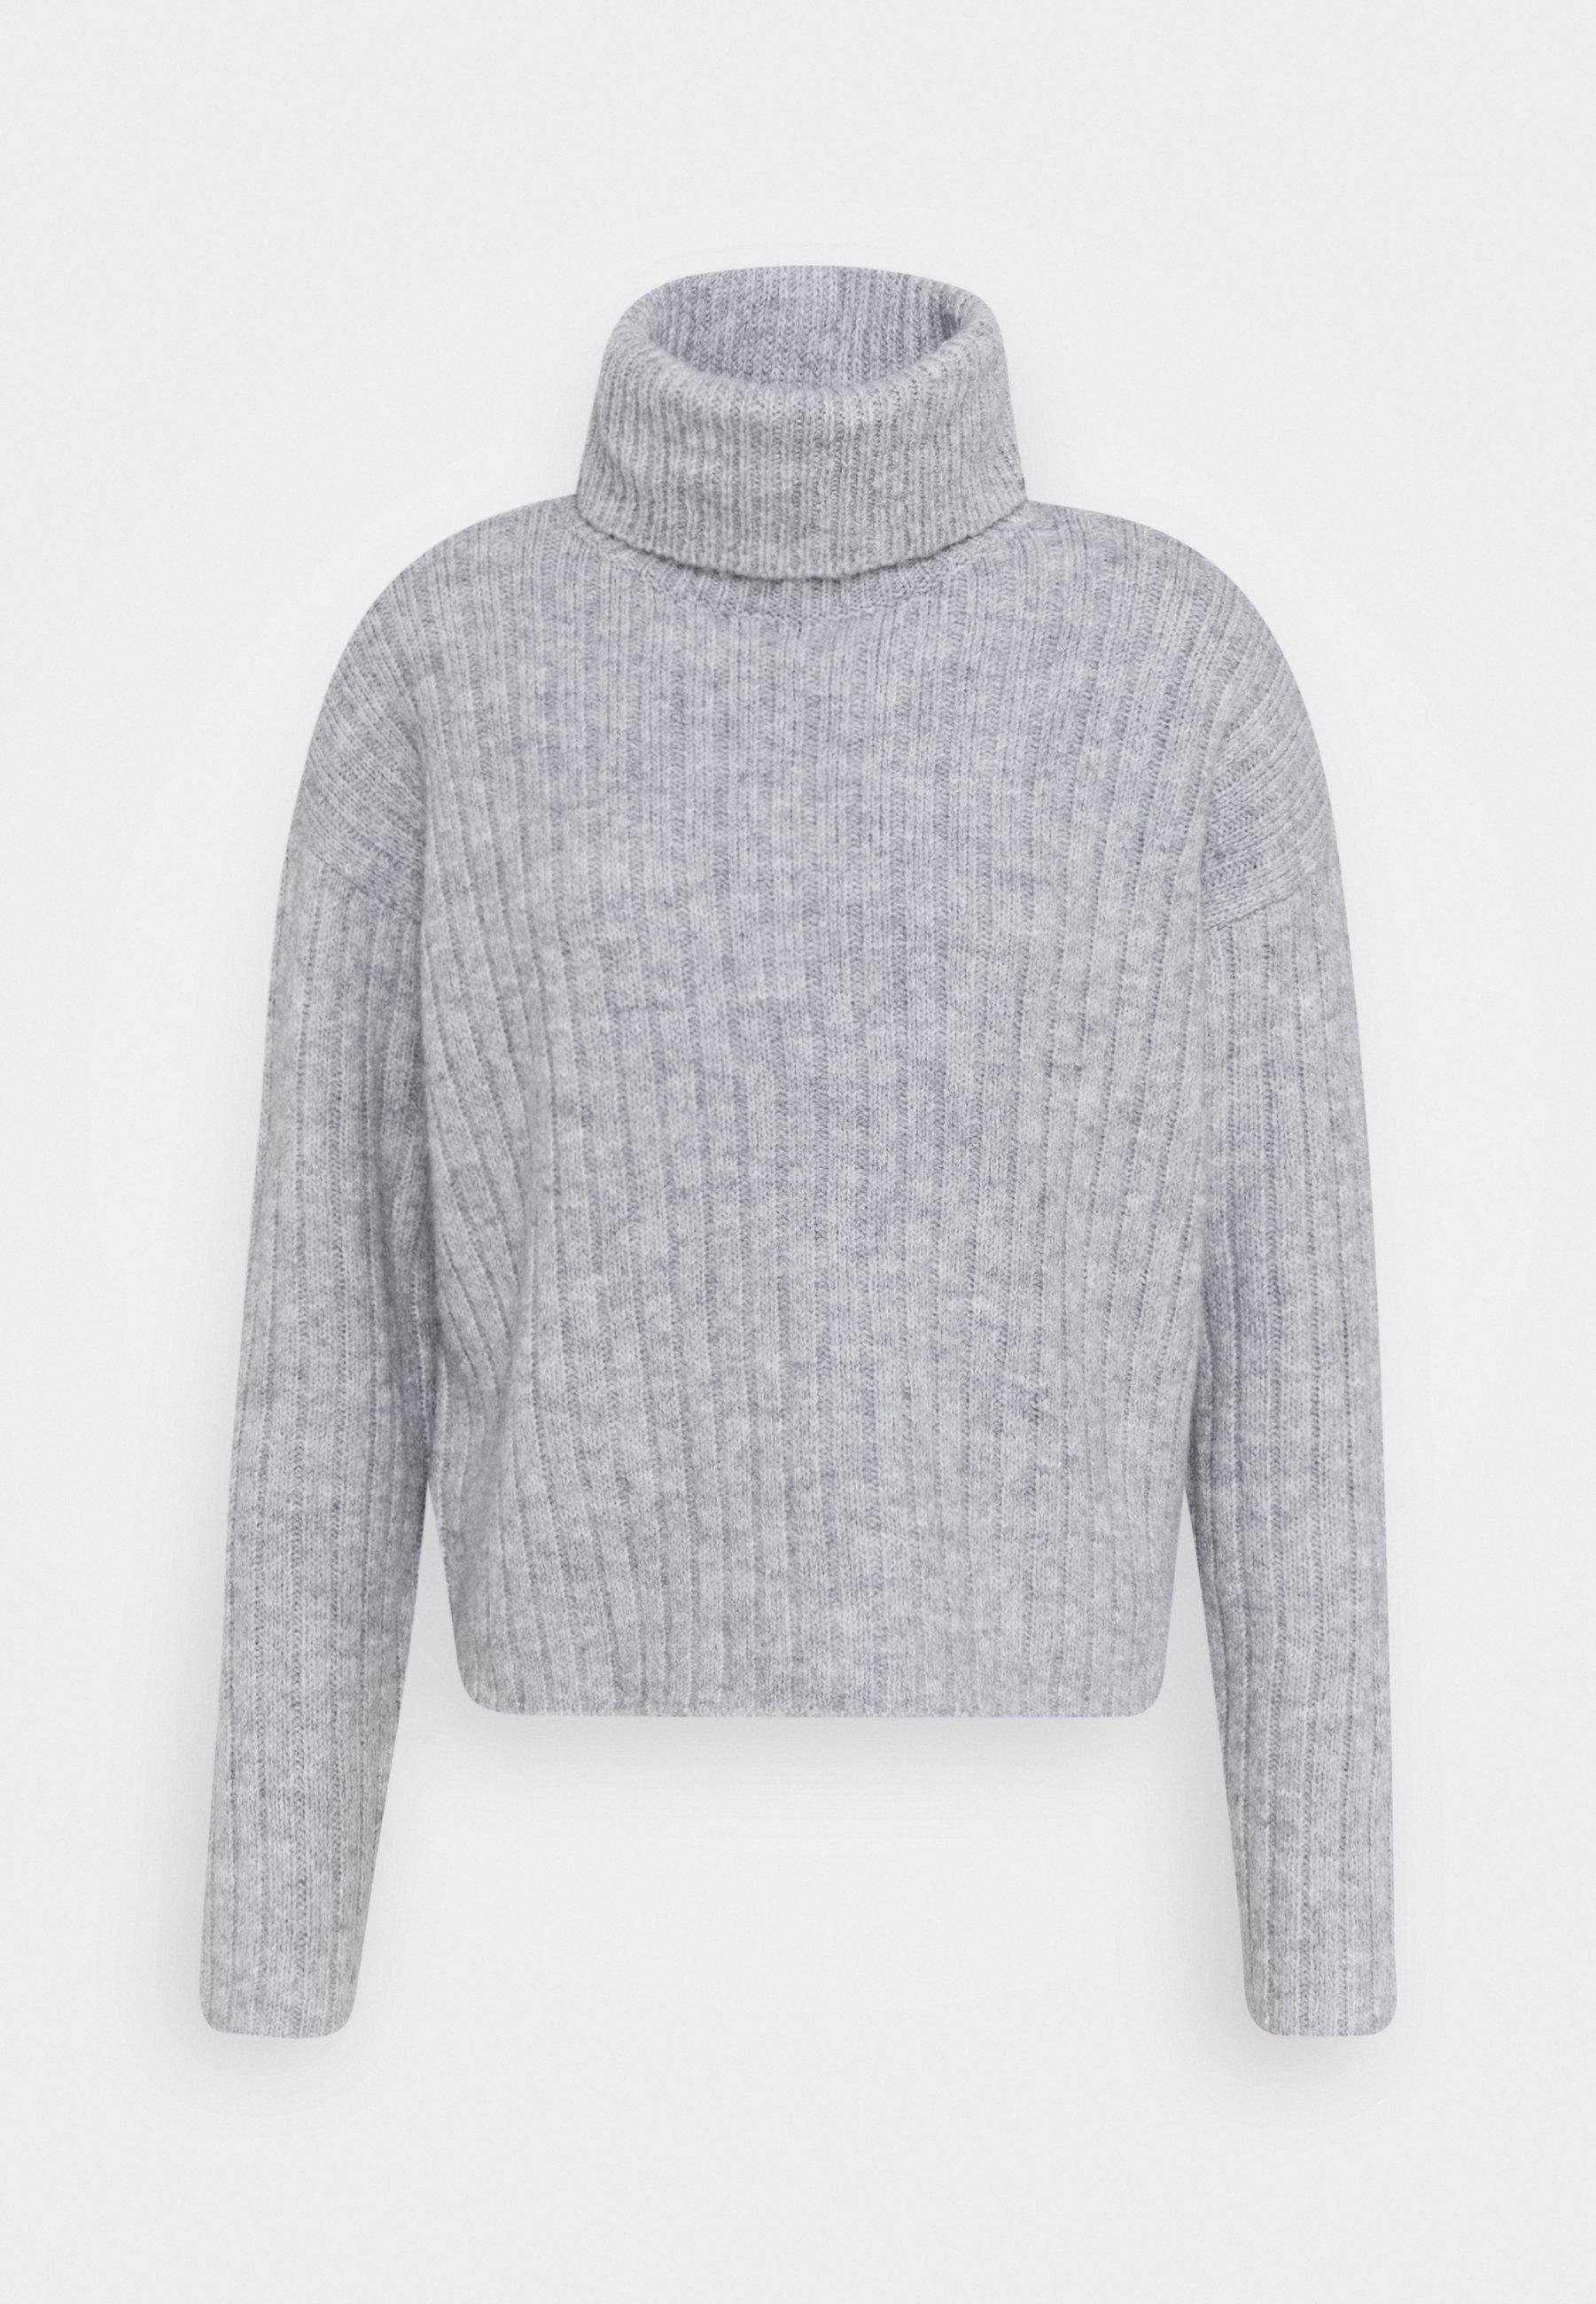 Damen Strickpullover - light grey